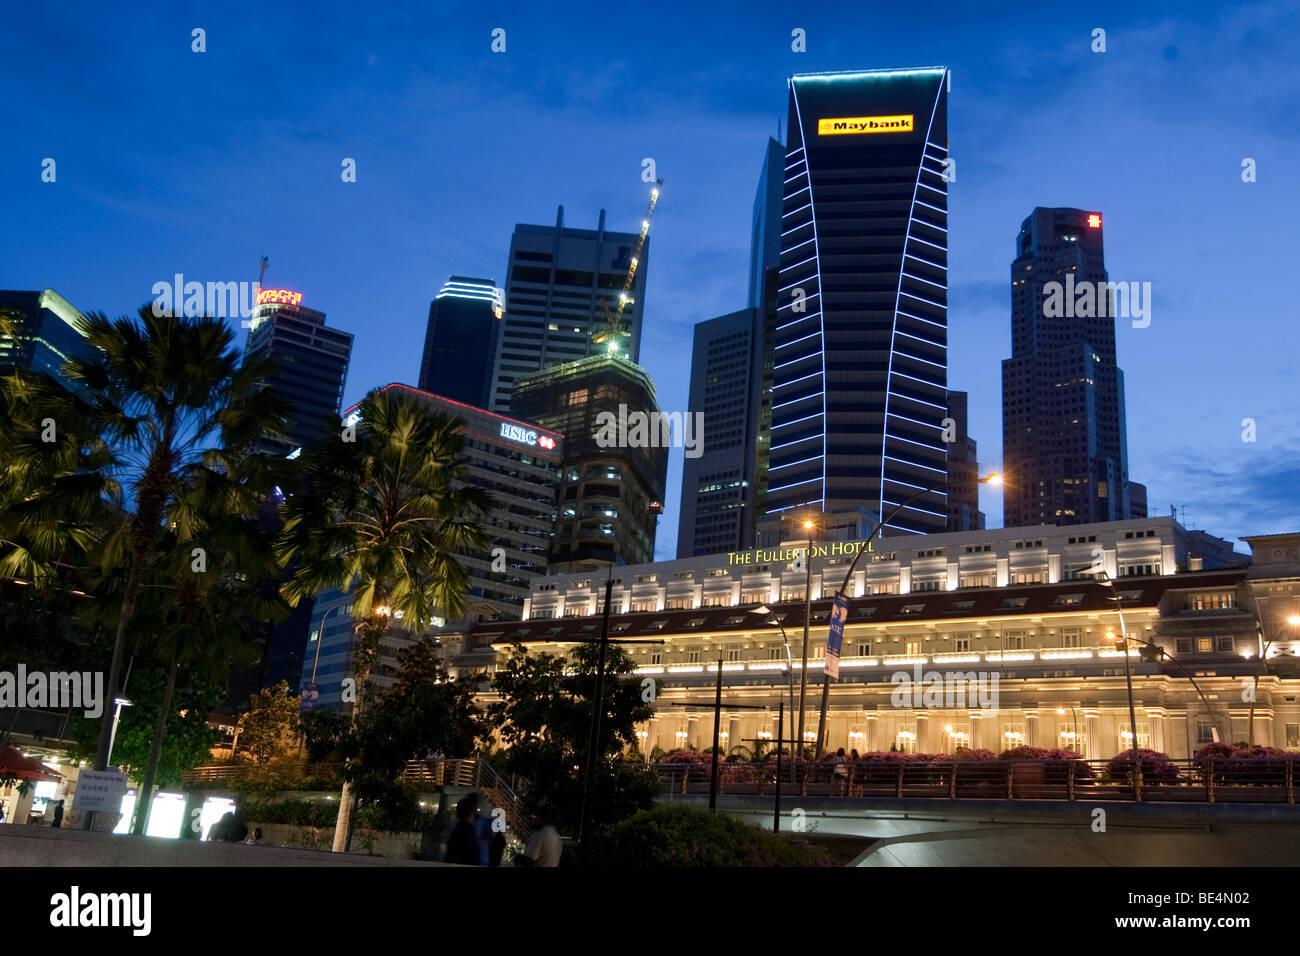 THE FULLERTON HOTEL SINGAPORE, five star luxury hotel, Singapore, Southeast Asia - Stock Image